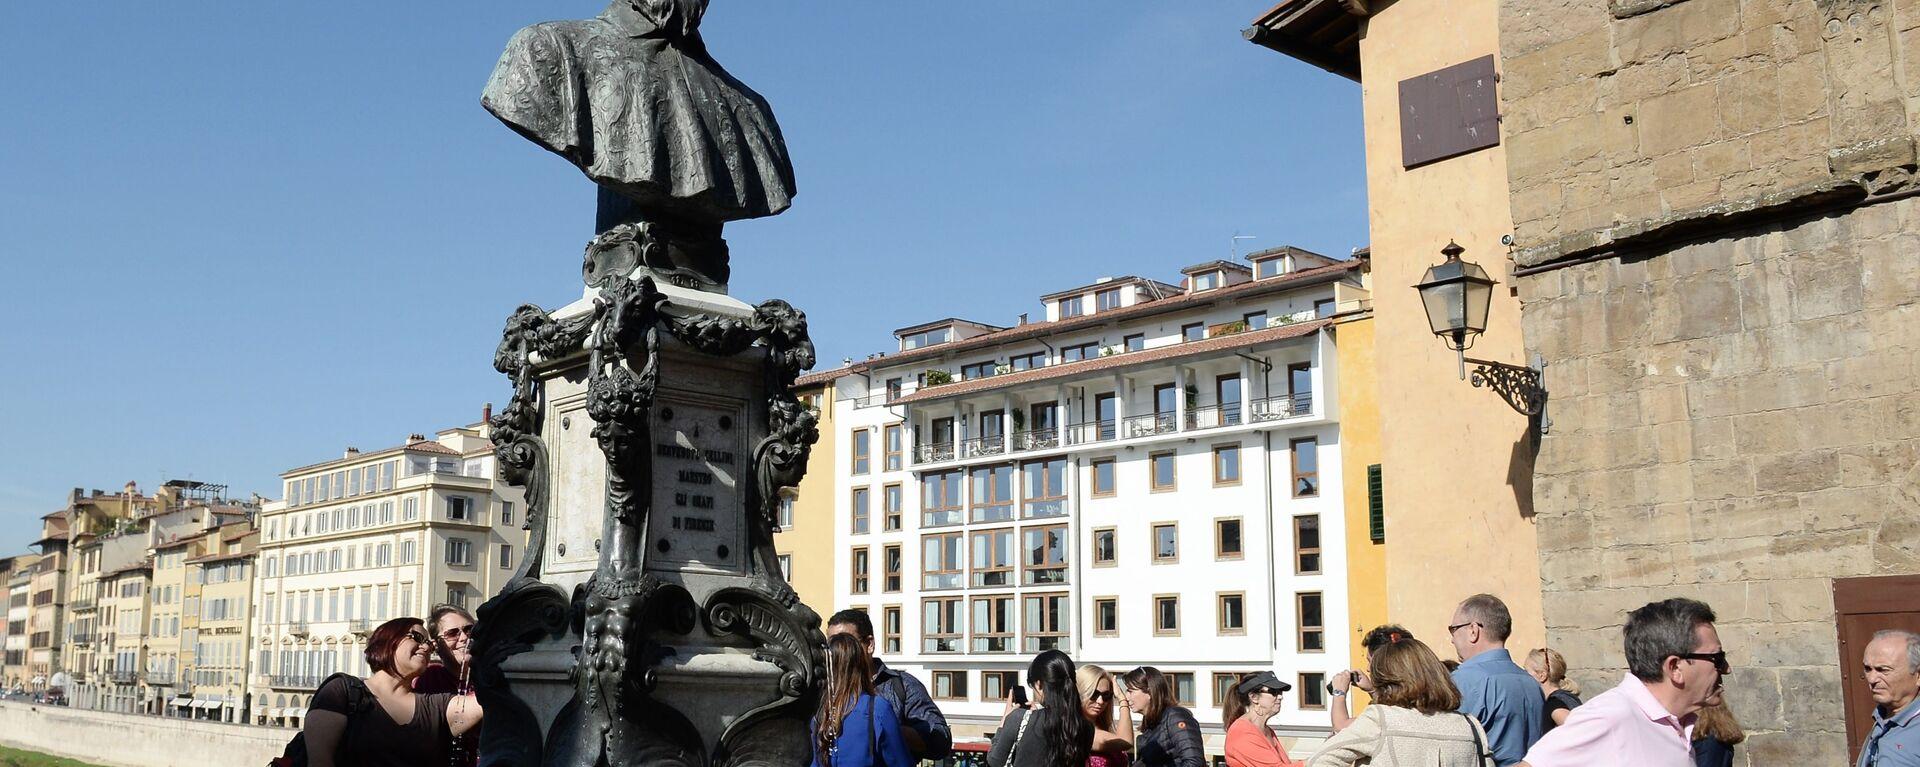 Turisti a Firenze - Sputnik Italia, 1920, 13.08.2021